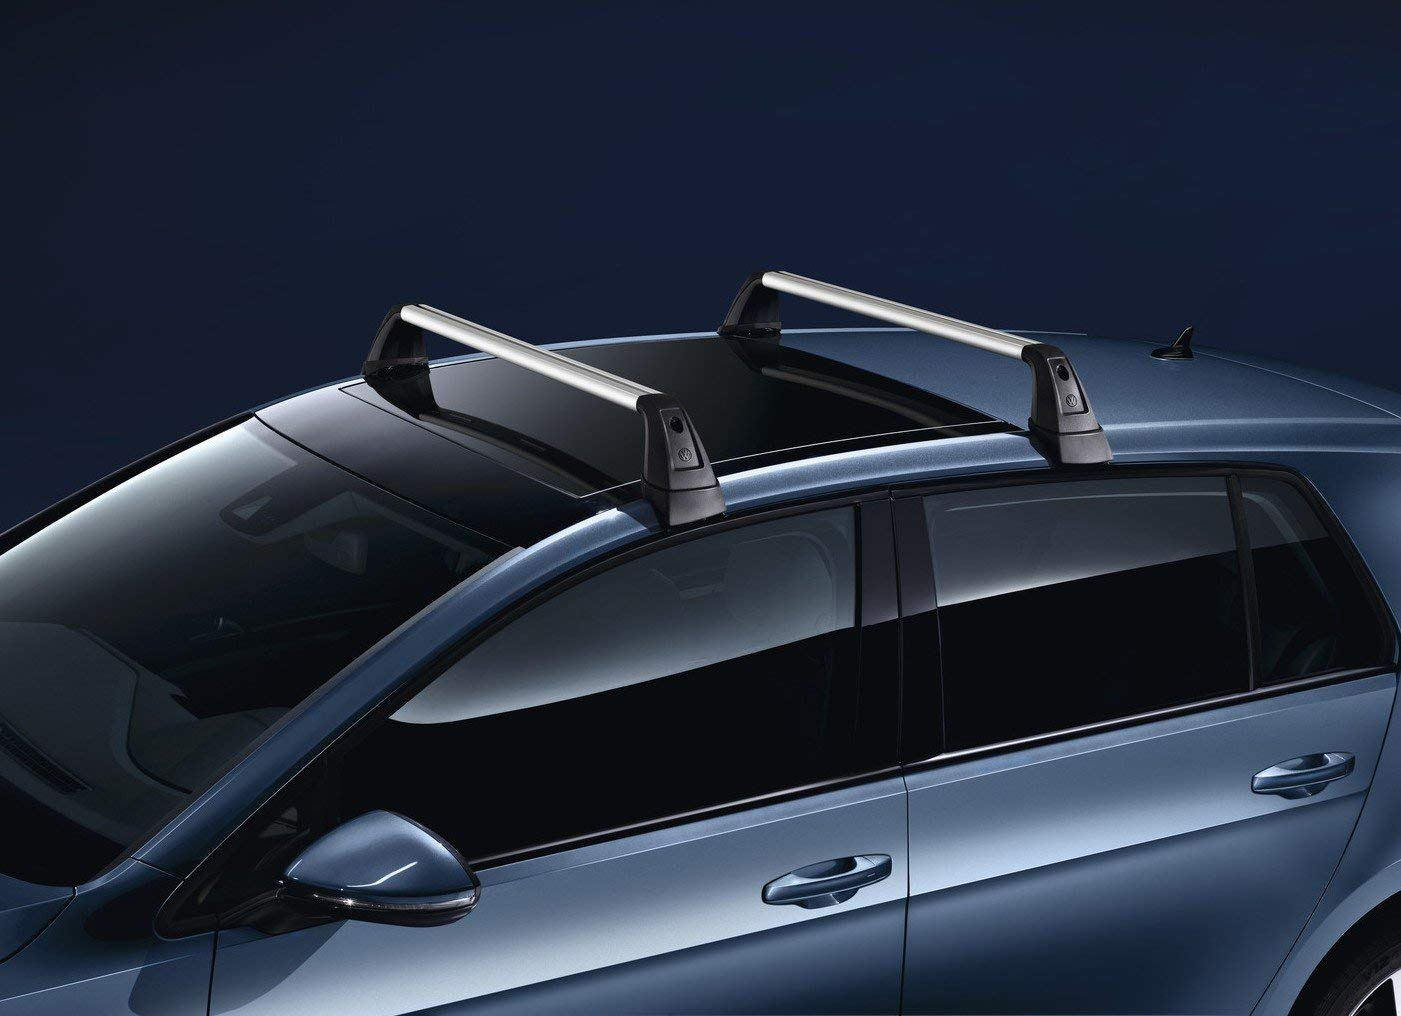 Raum22 Wraps Audi R8 Like F16 Arctic Aggressor Fighter Jet